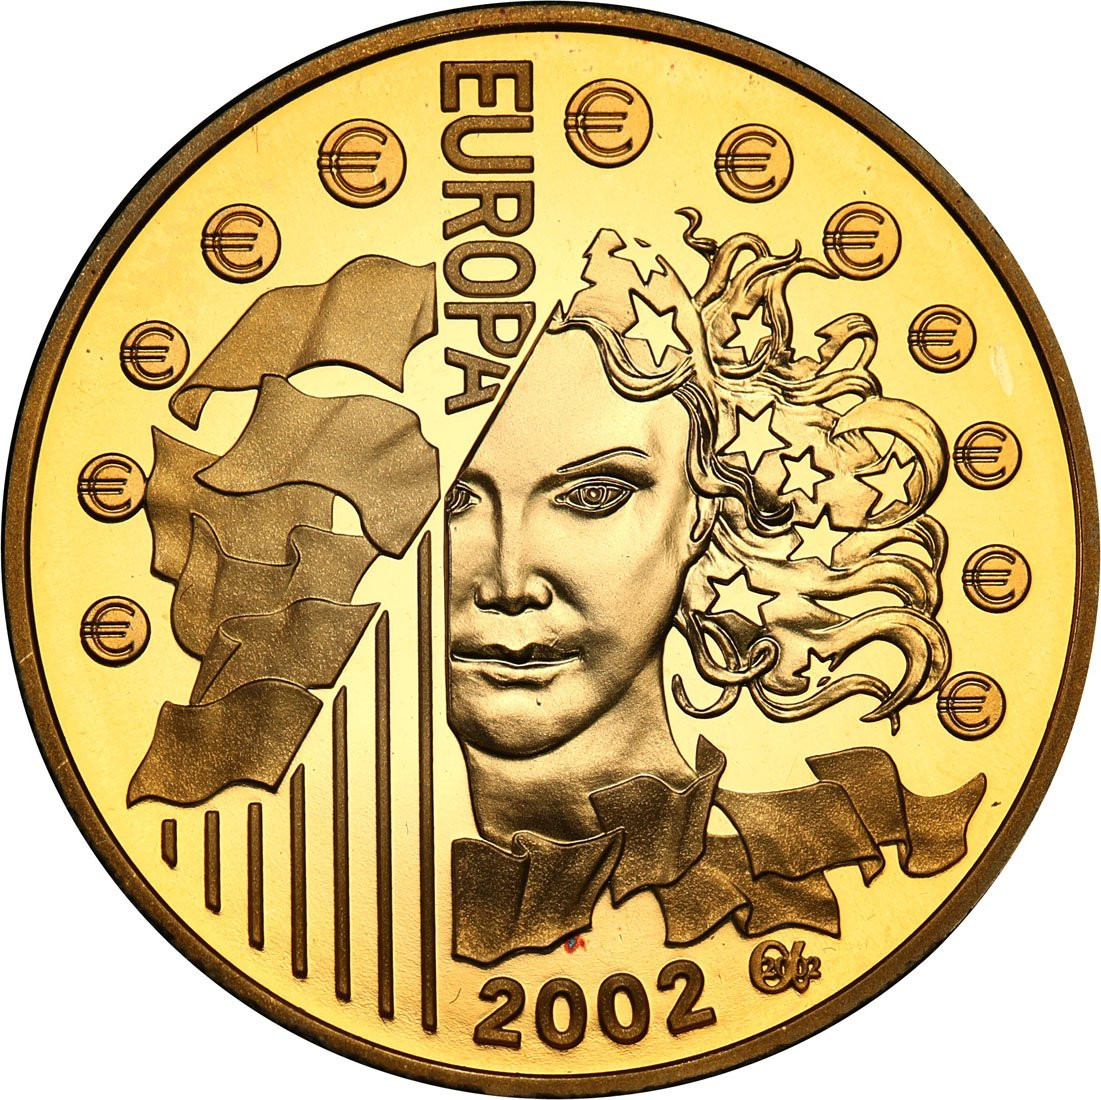 Francja 10 Euro 2002 - 200 lat franka francuskiego